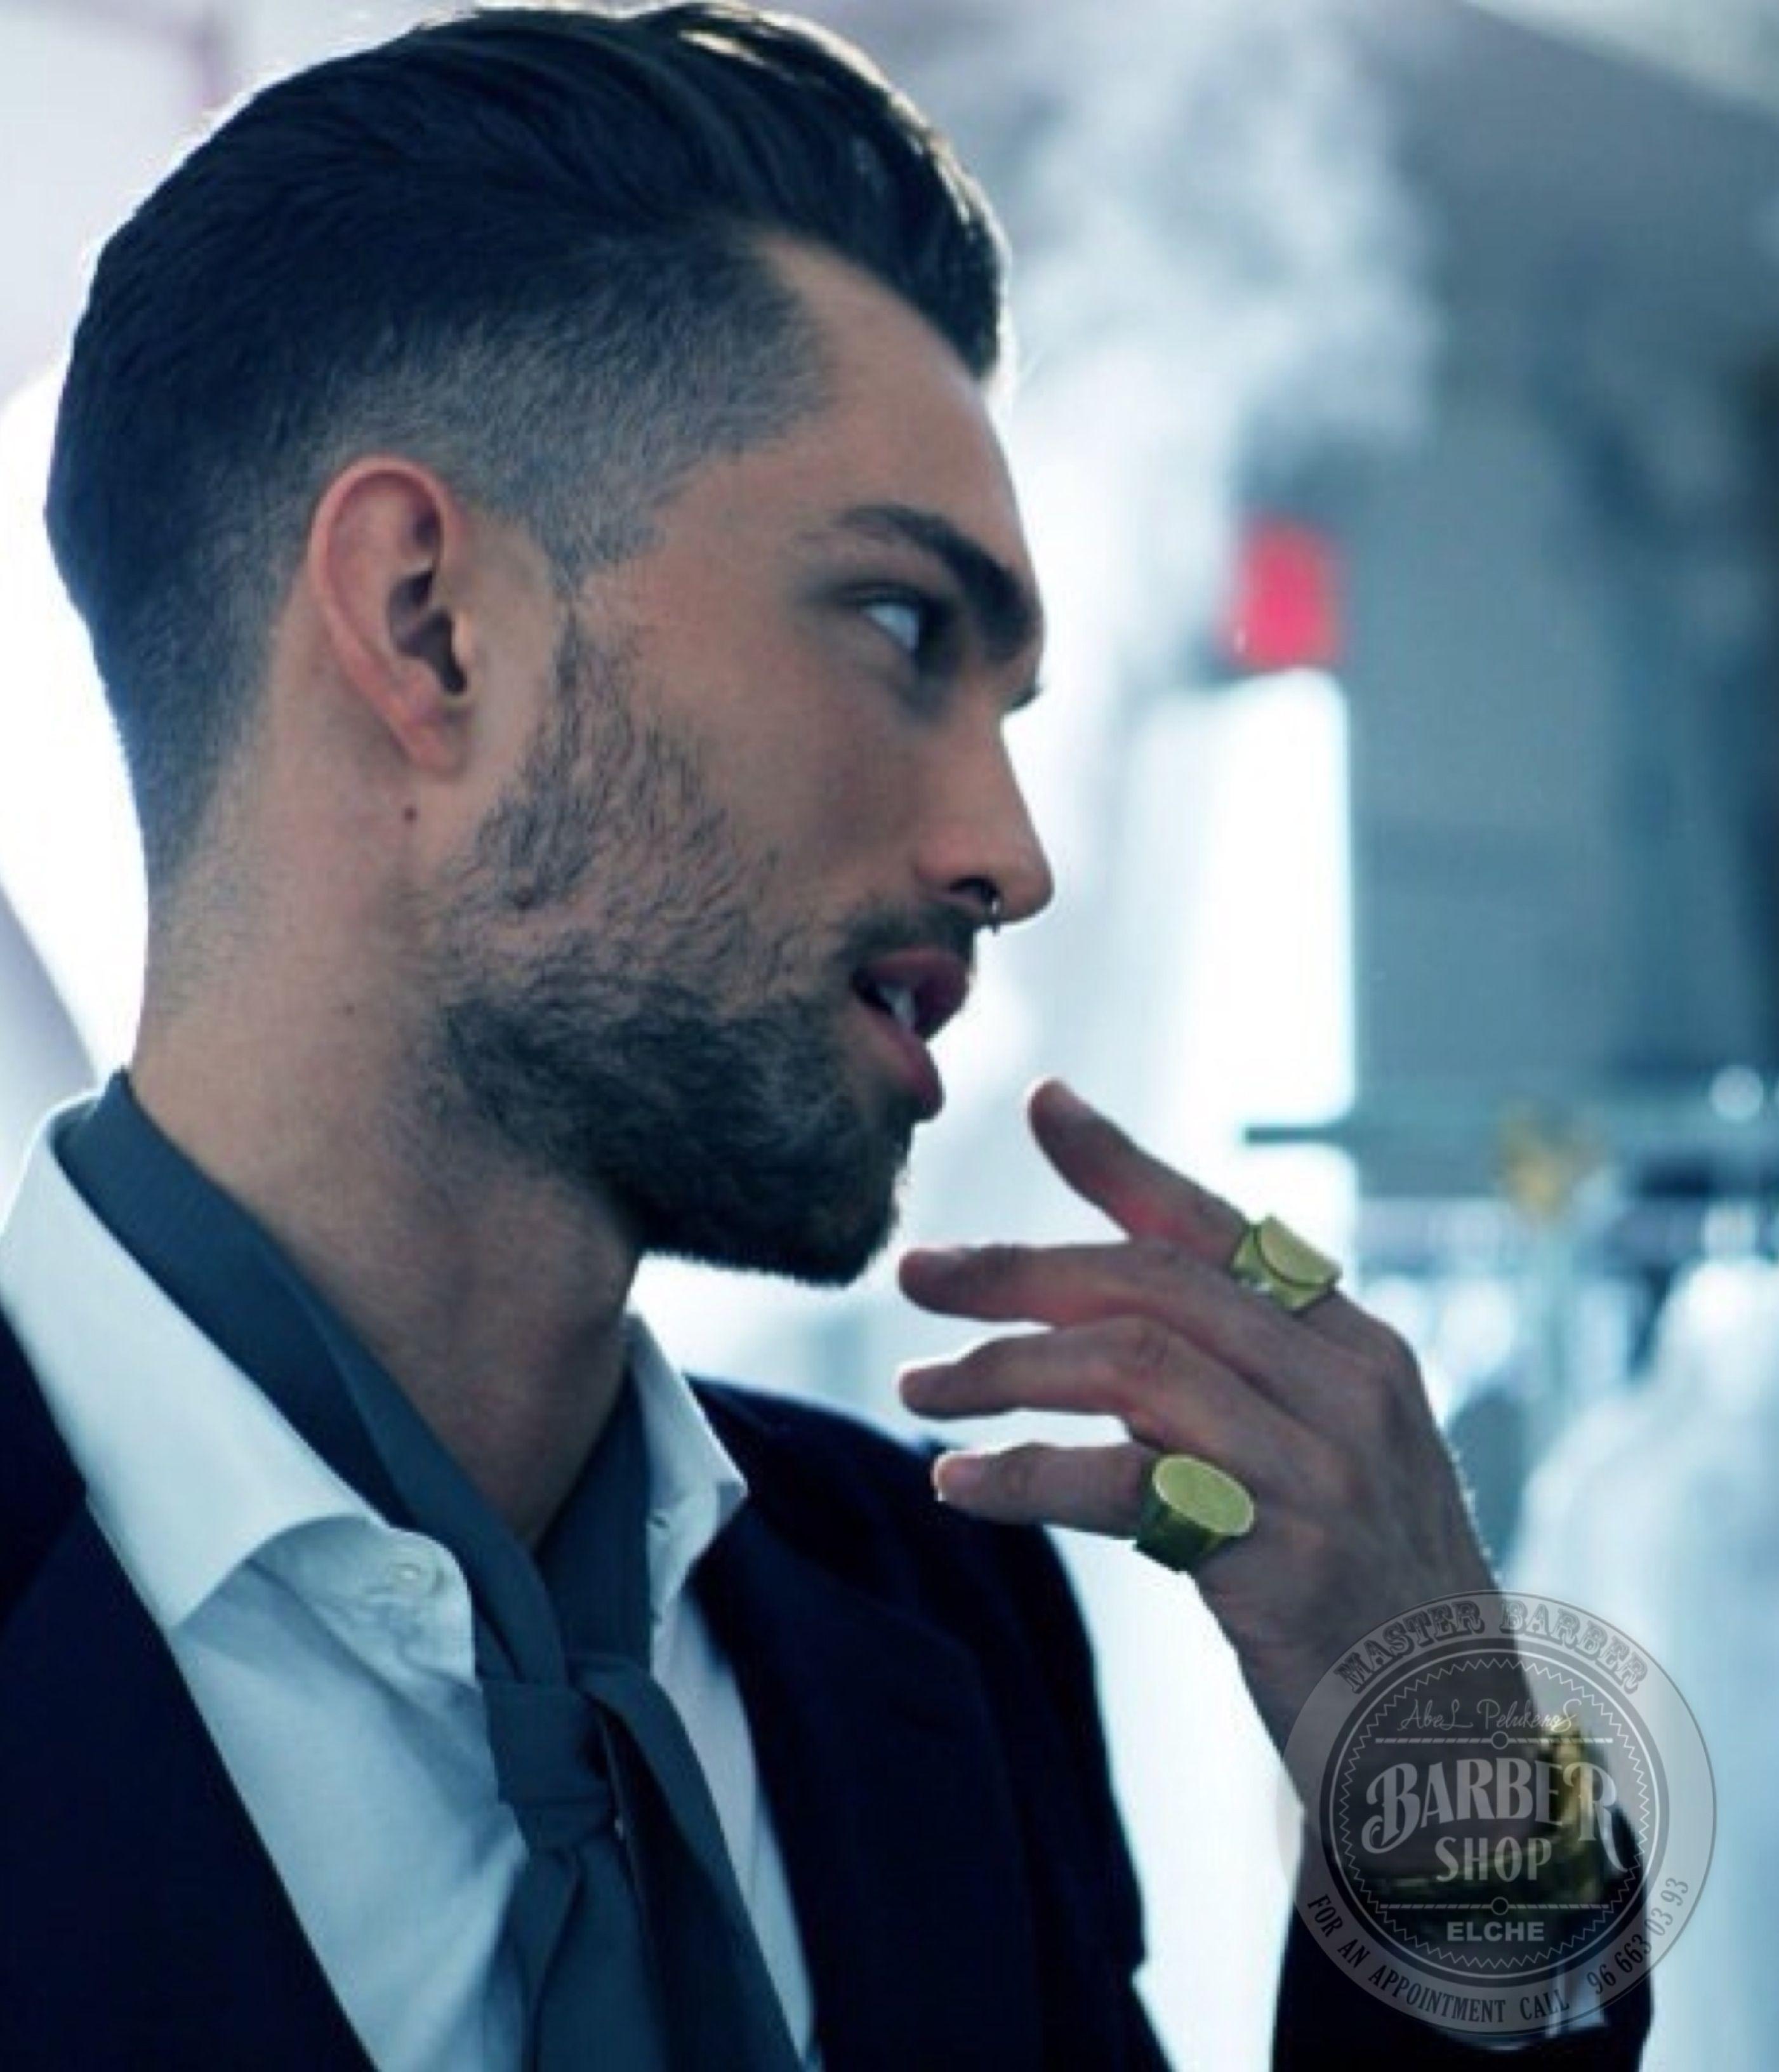 men's undercut | hairstyles trends for men | pinterest | undercut